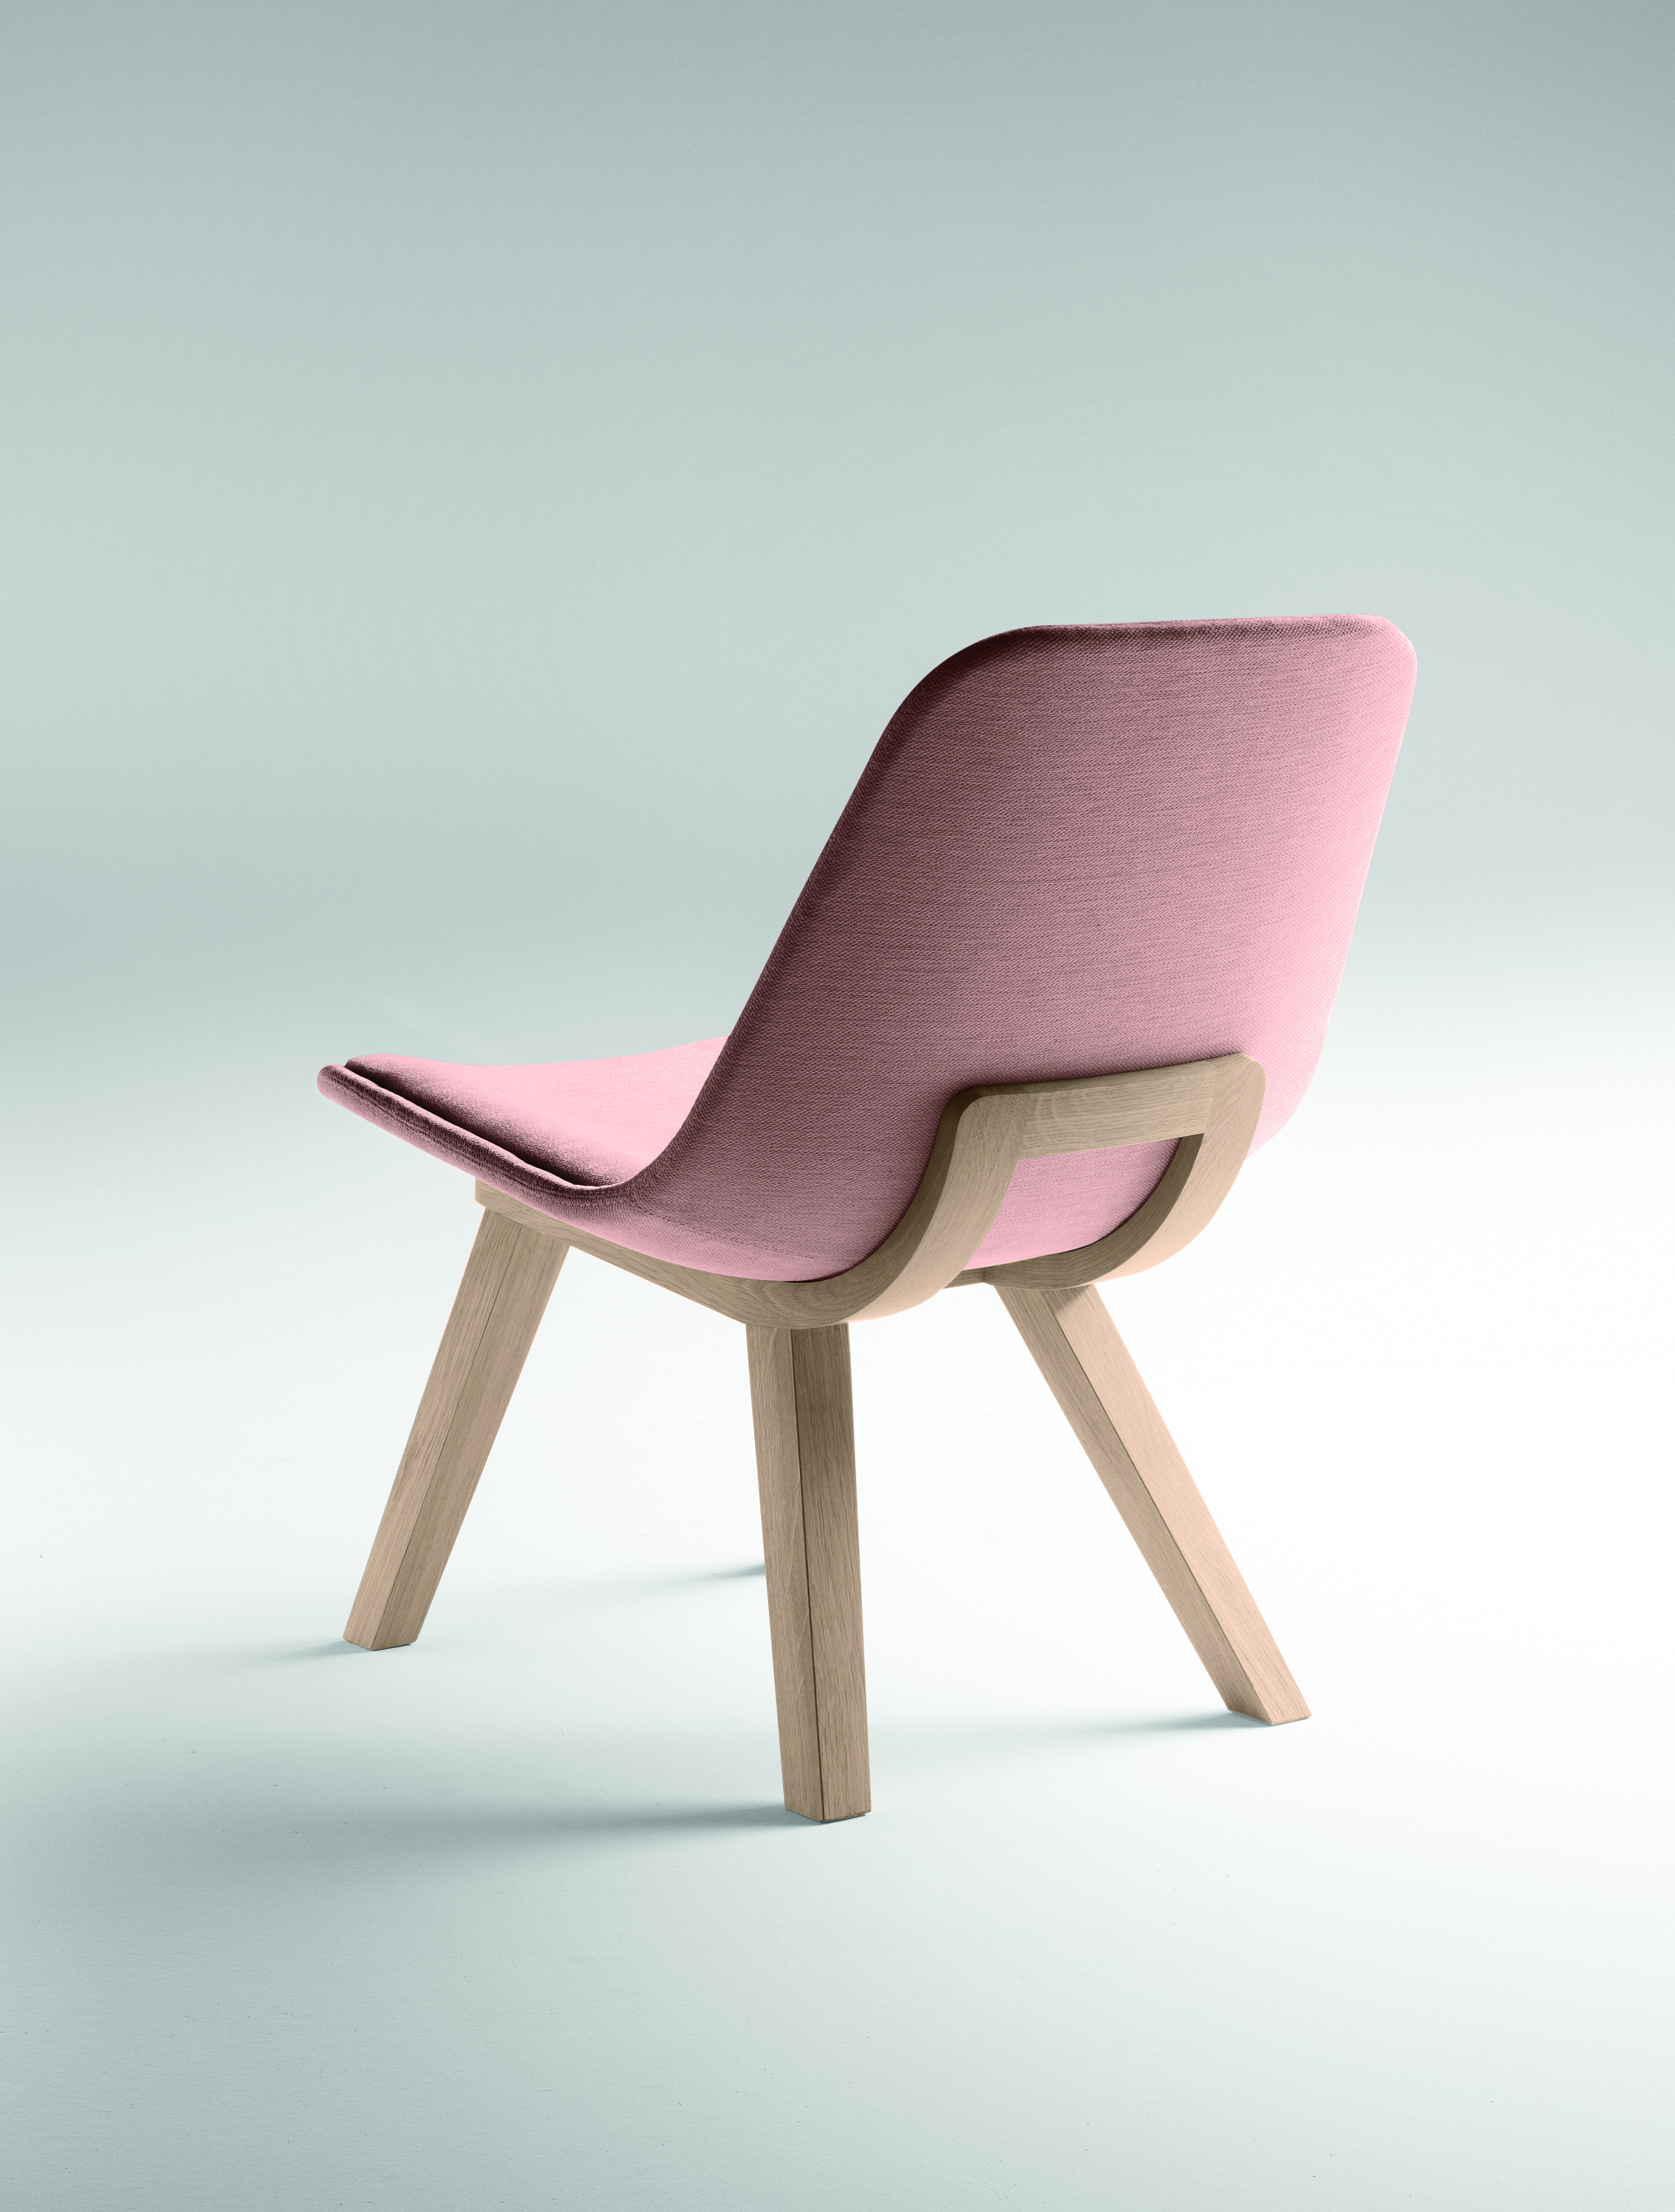 kuskoa petit fauteuil by alki design jean louis iratzoki. Black Bedroom Furniture Sets. Home Design Ideas